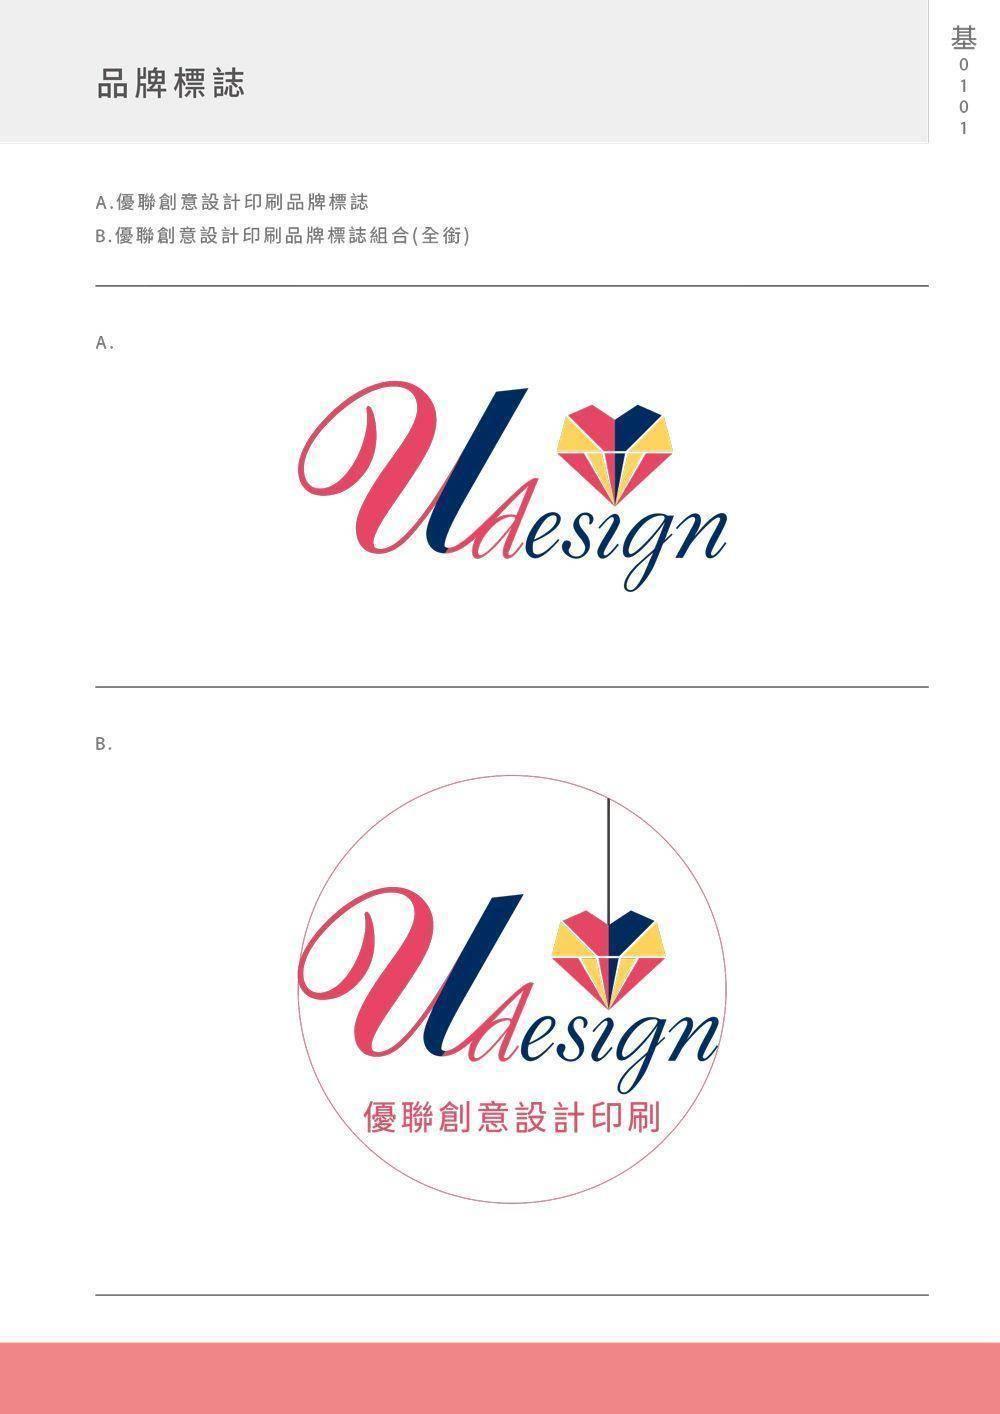 CIS企業識別設計系統-VI設計品牌標誌